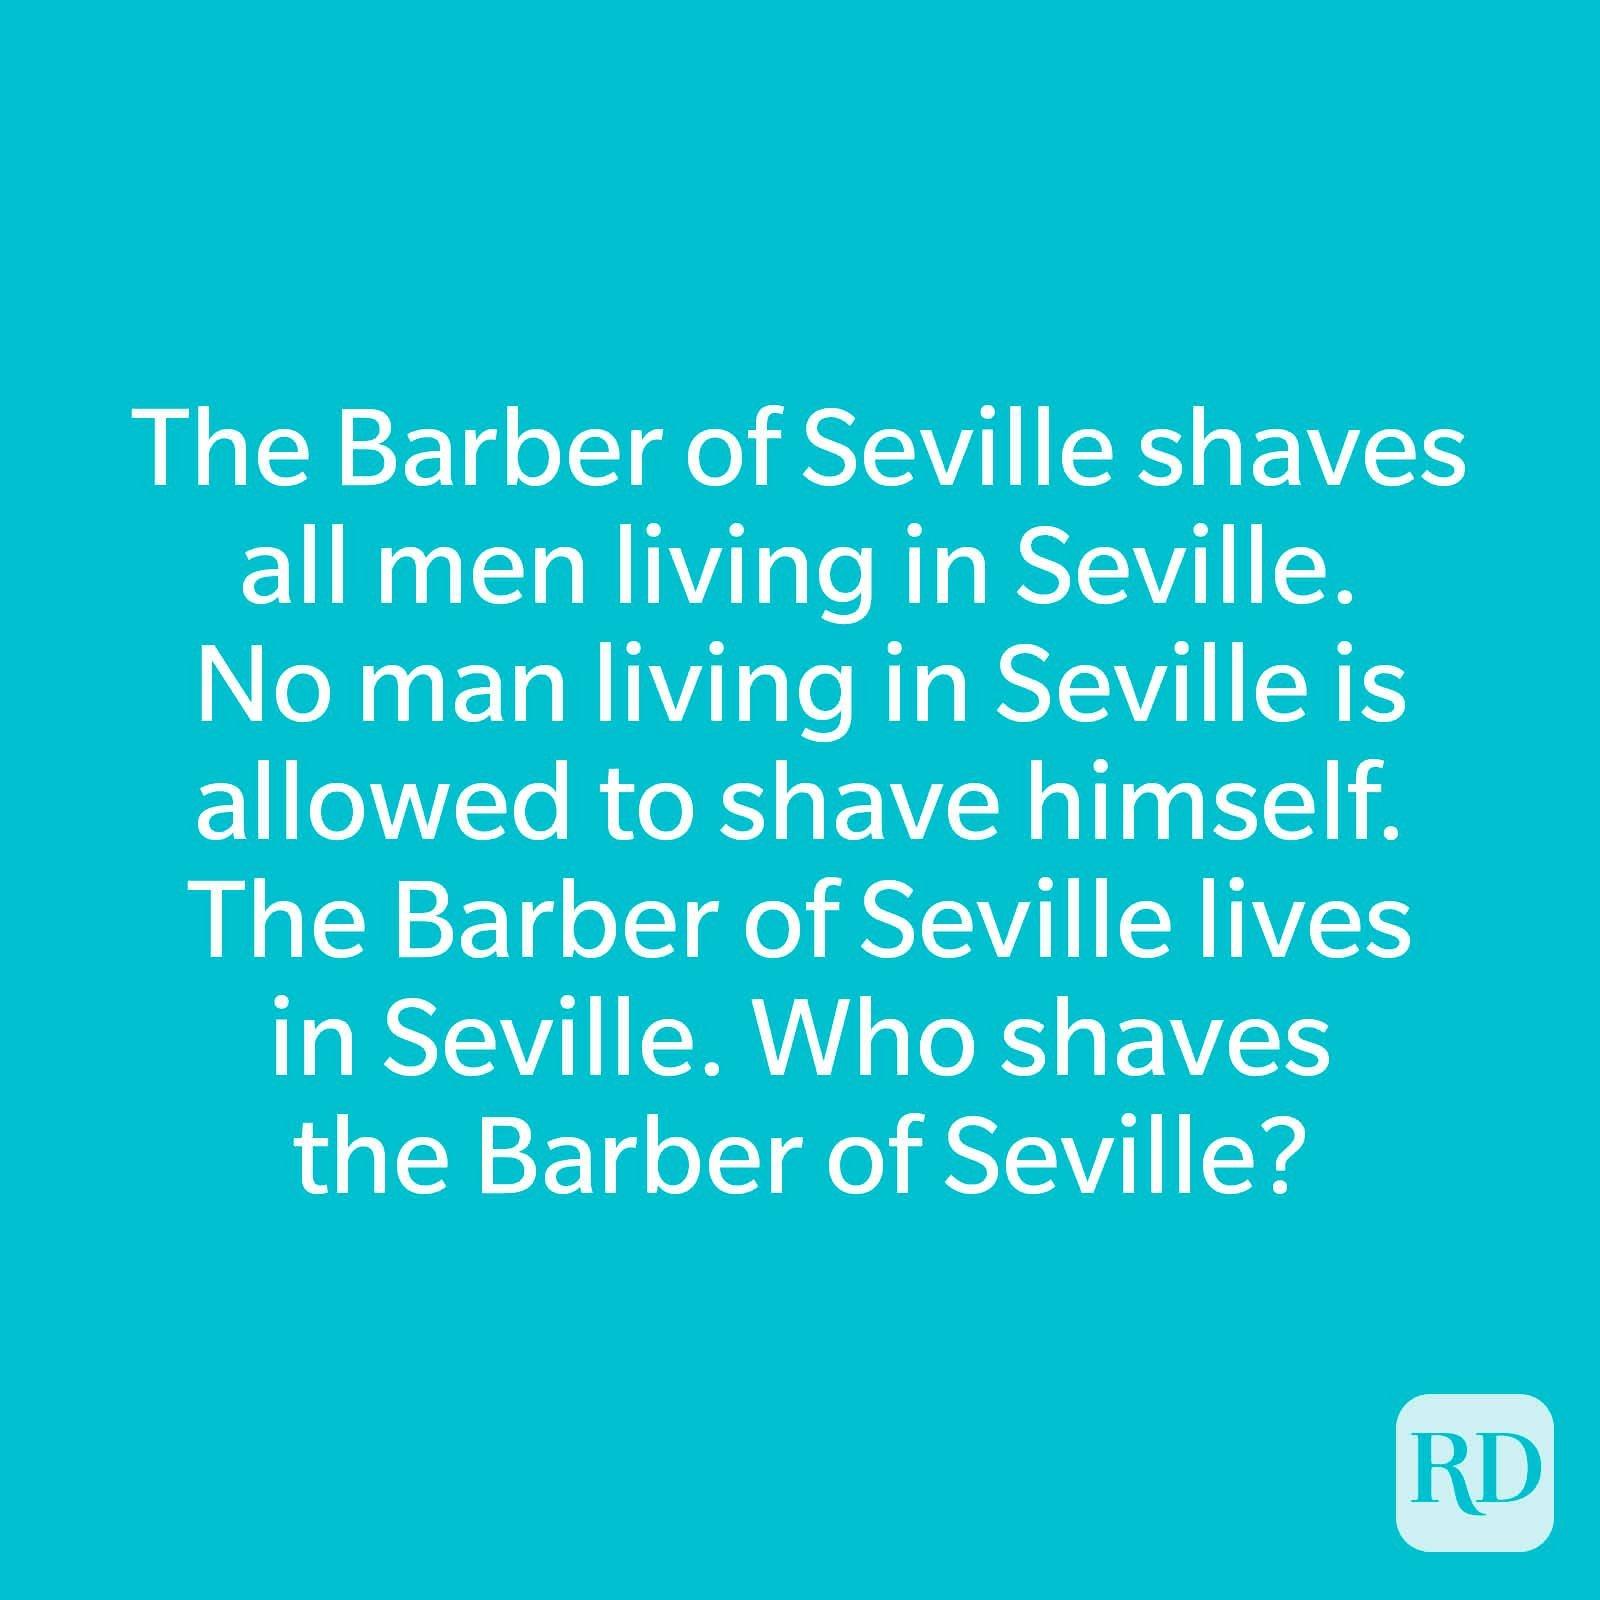 The Barber of Seville shaves all men living in Seville. No man living in Seville is allowed to shave himself. The Barber of Seville lives in Seville. Who shaves the Barber of Seville?